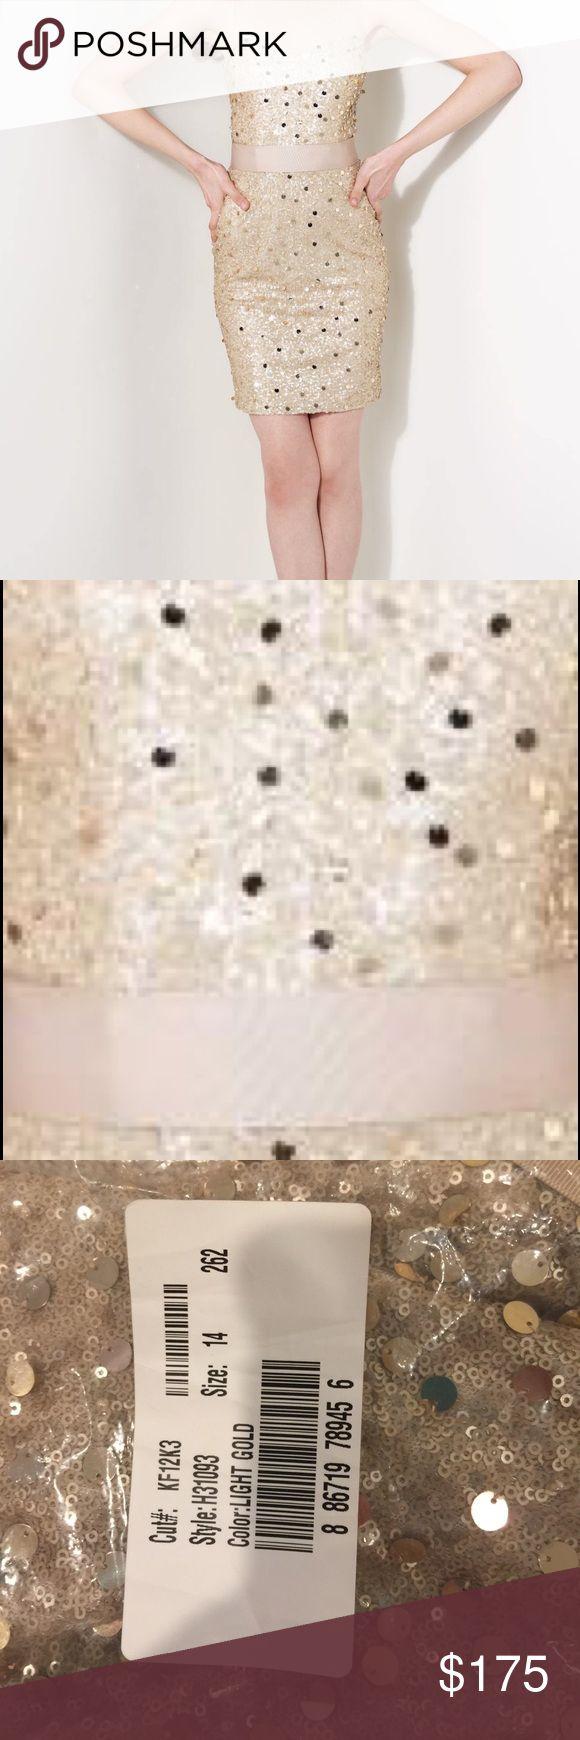 Timeless Kathy Hilton Cocktail Dress Light Gold Kathy Hilton Dress. Size 14. Style #H31093 Kathy Hilton Dresses